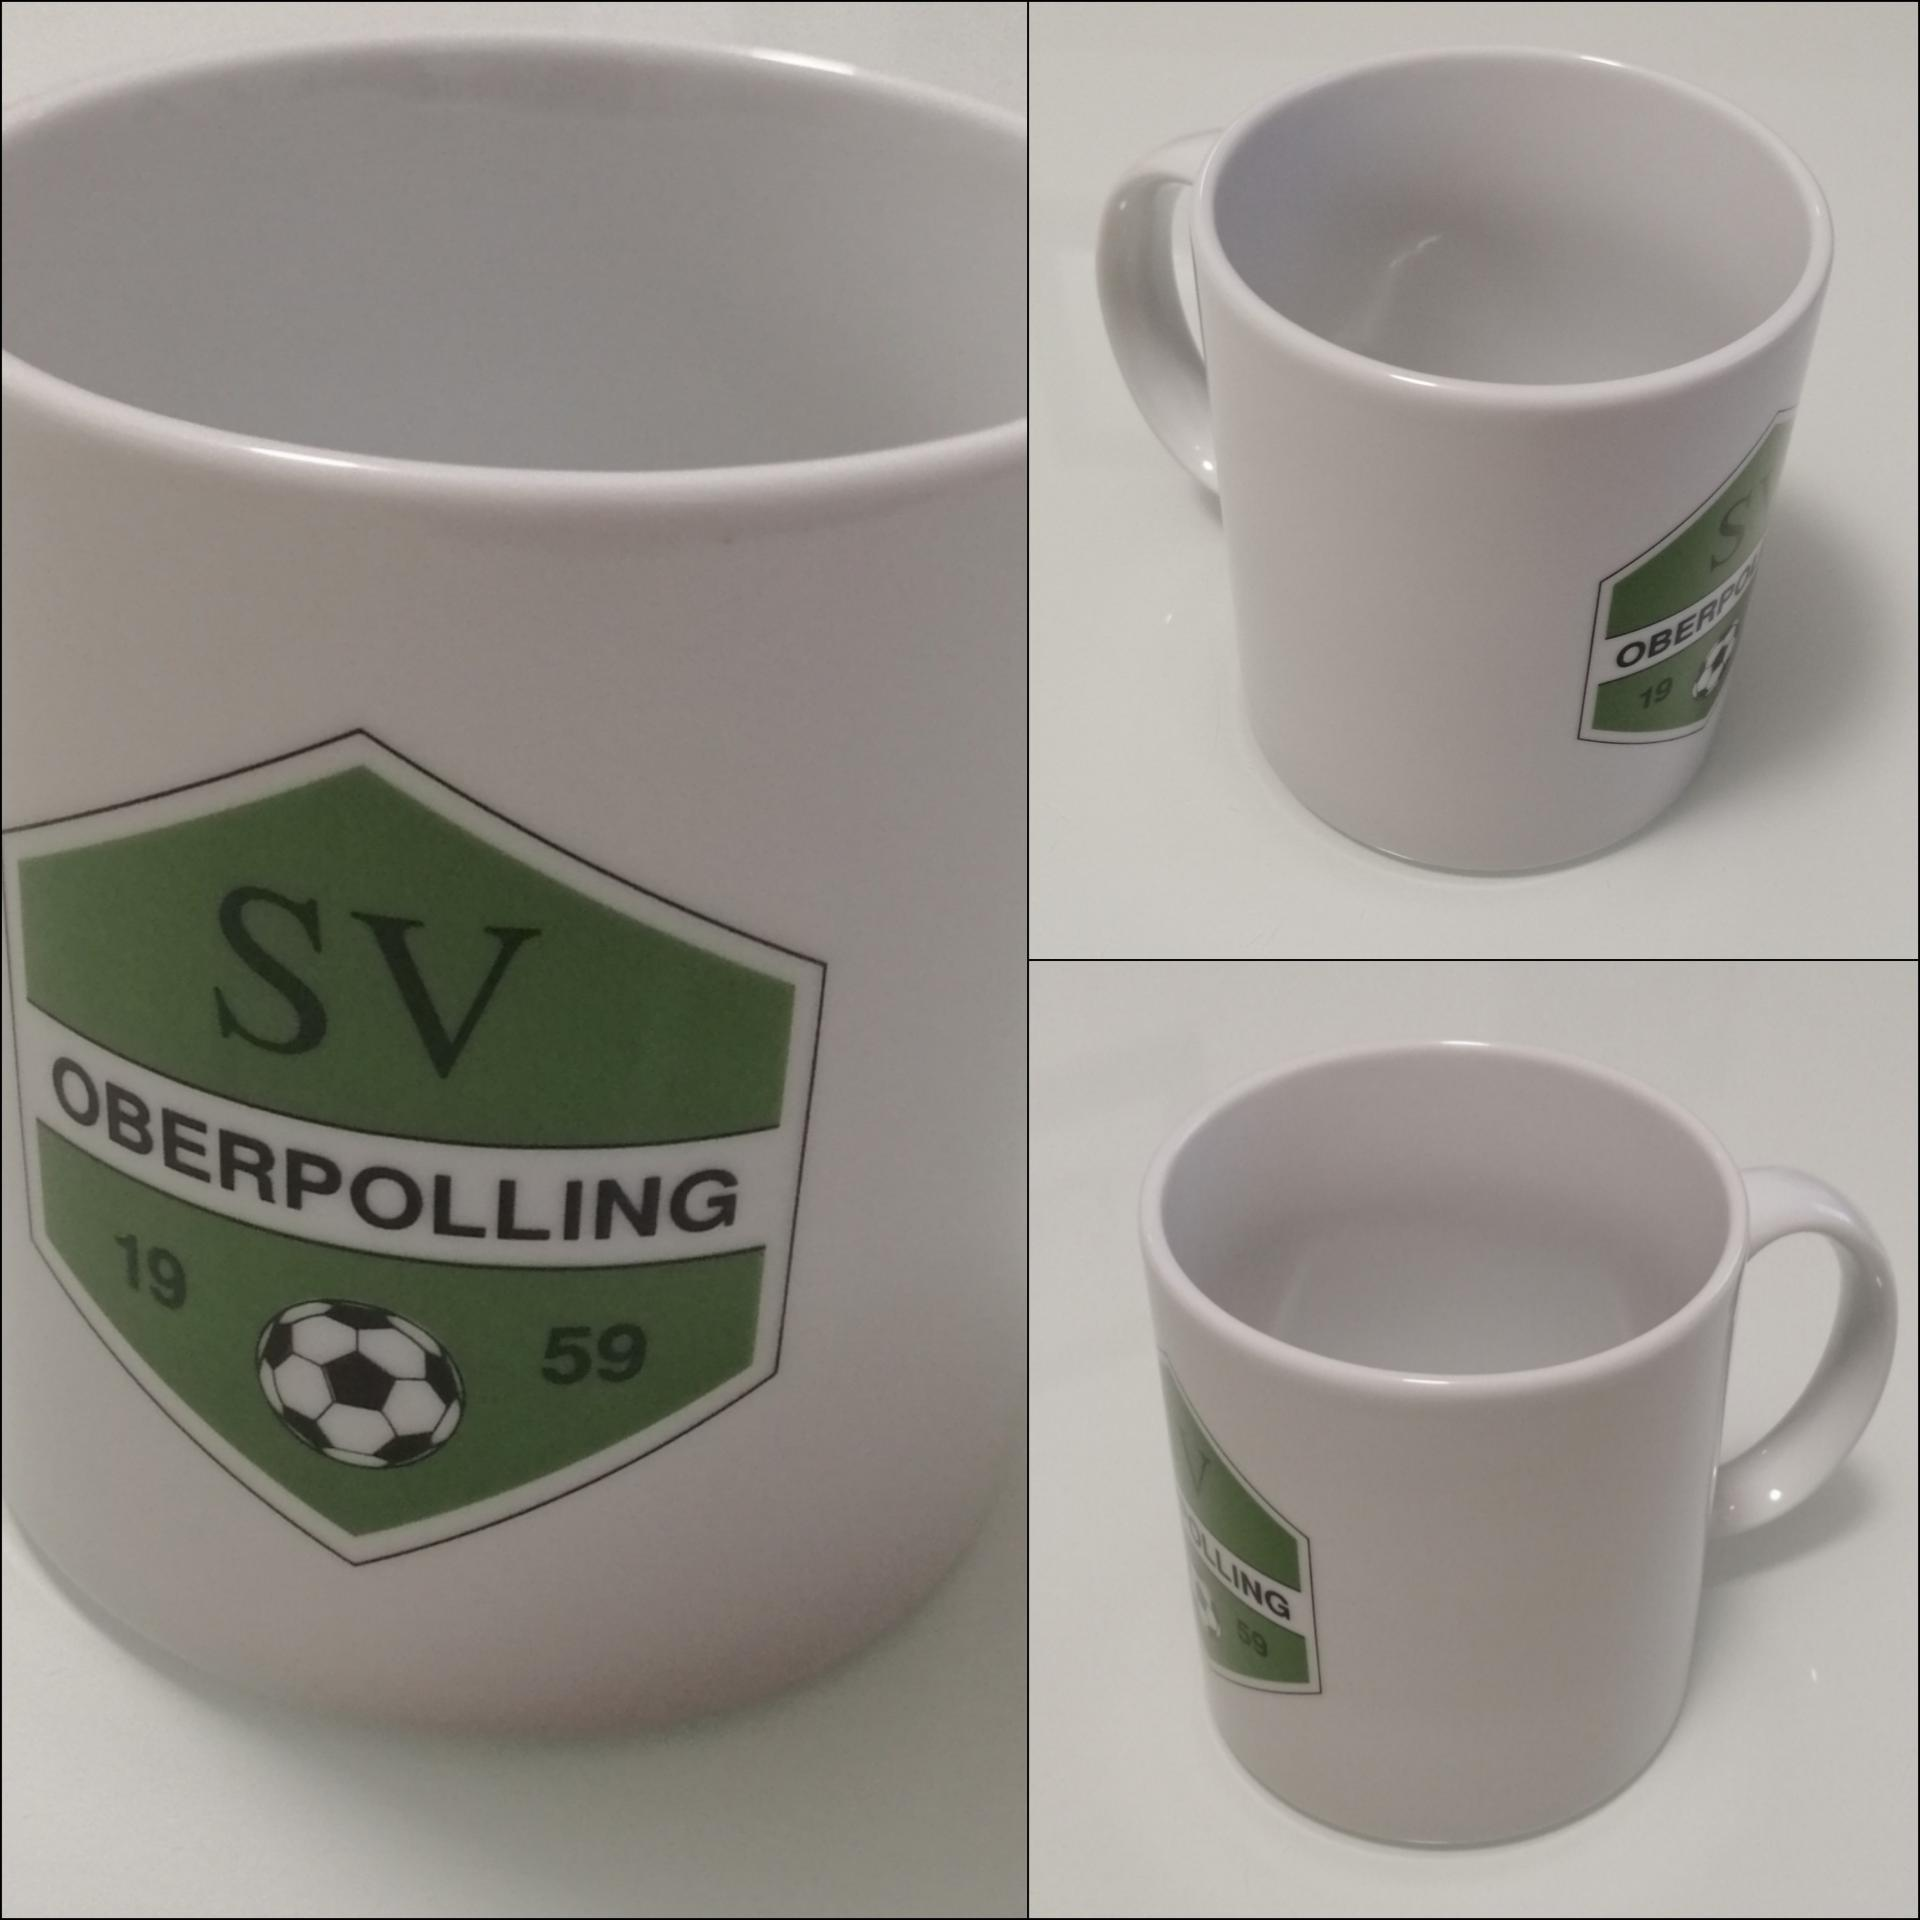 SVO Kaffee Haferl